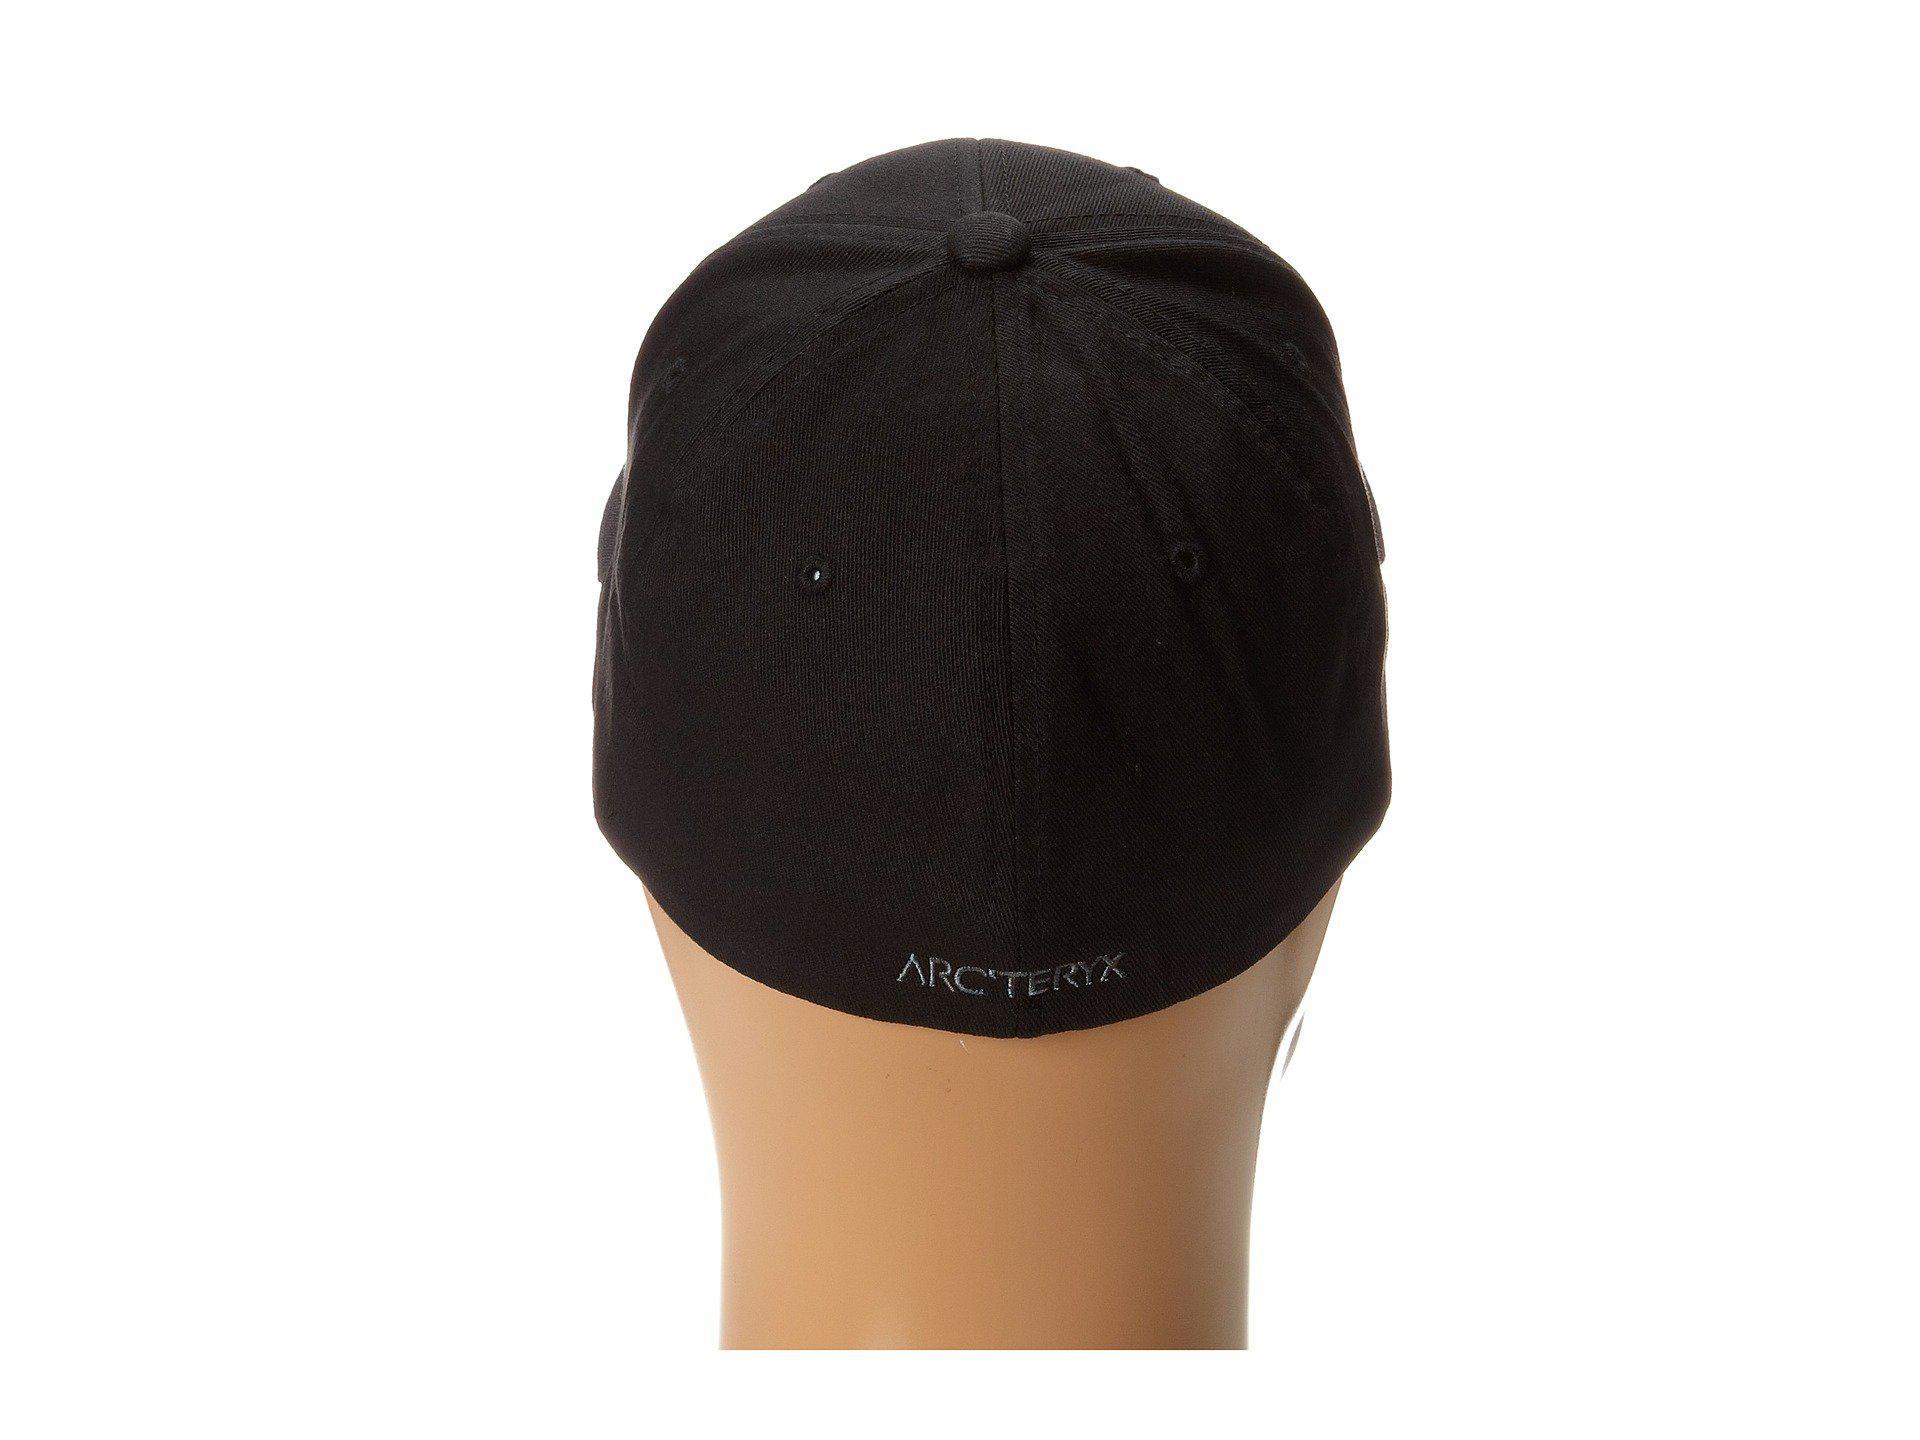 444dd231f Arc'teryx Embroidered Bird Cap (black) Caps in Black - Lyst